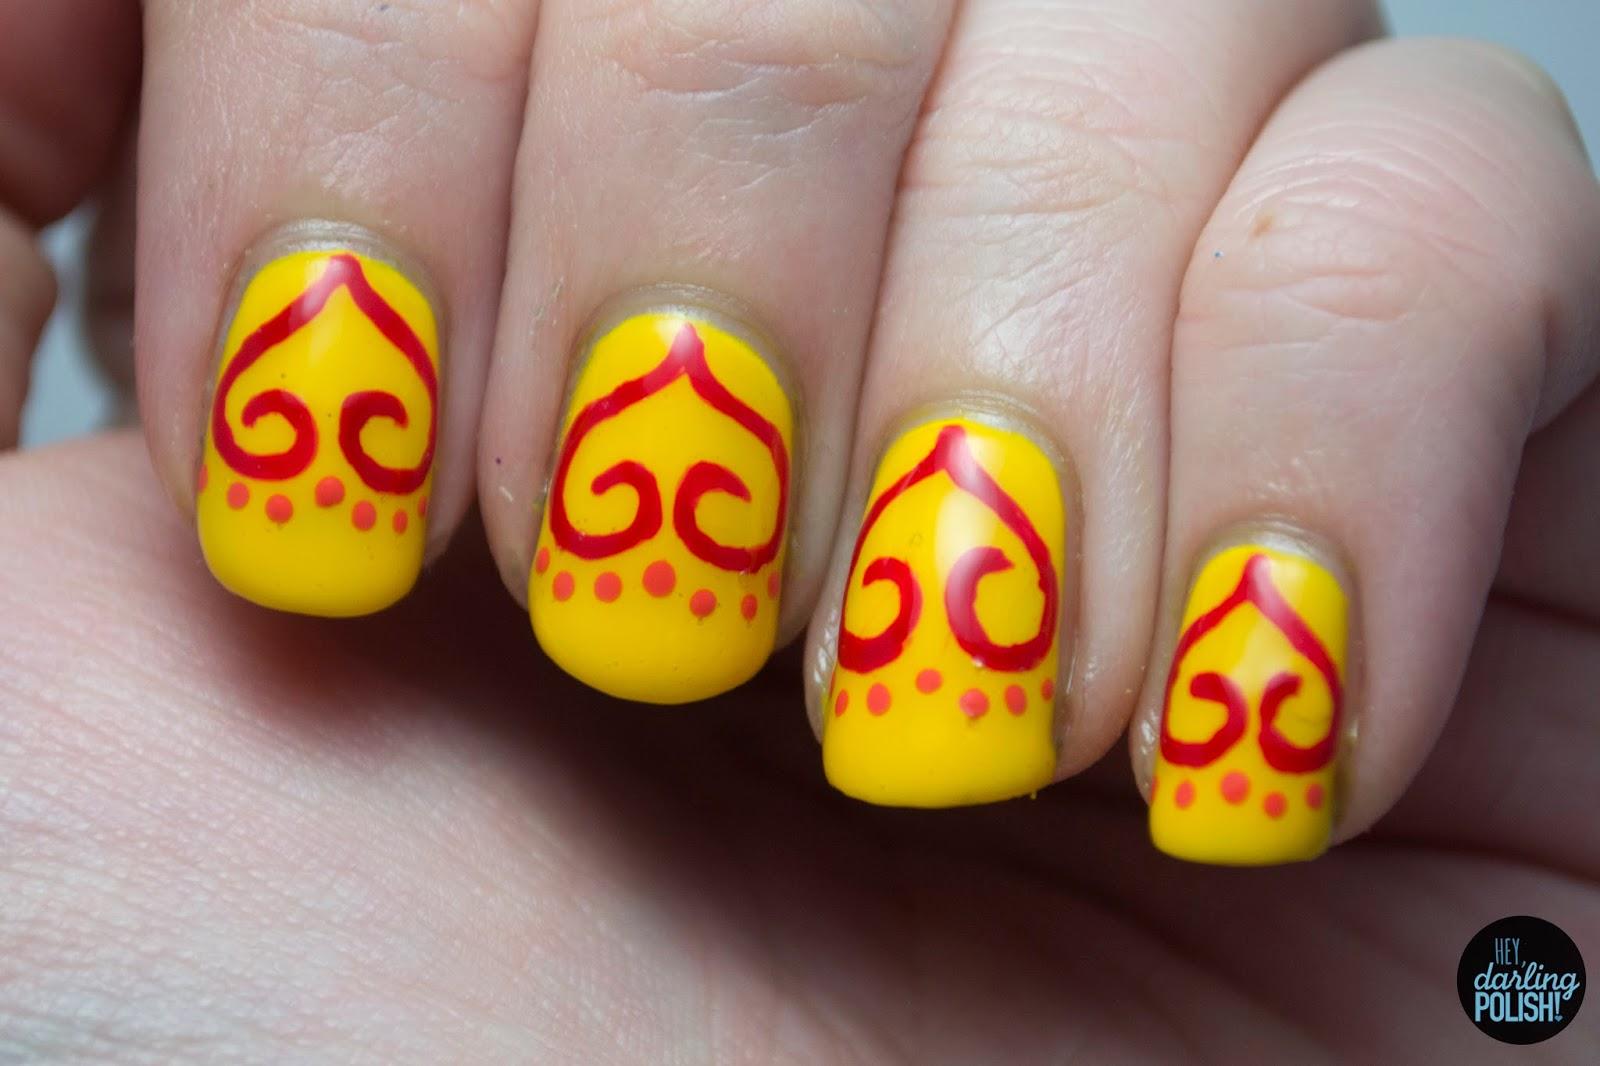 nails, nail polish, polish, nail art, yellow, red, orange, hey darling polish, tri polish challenge, tpc